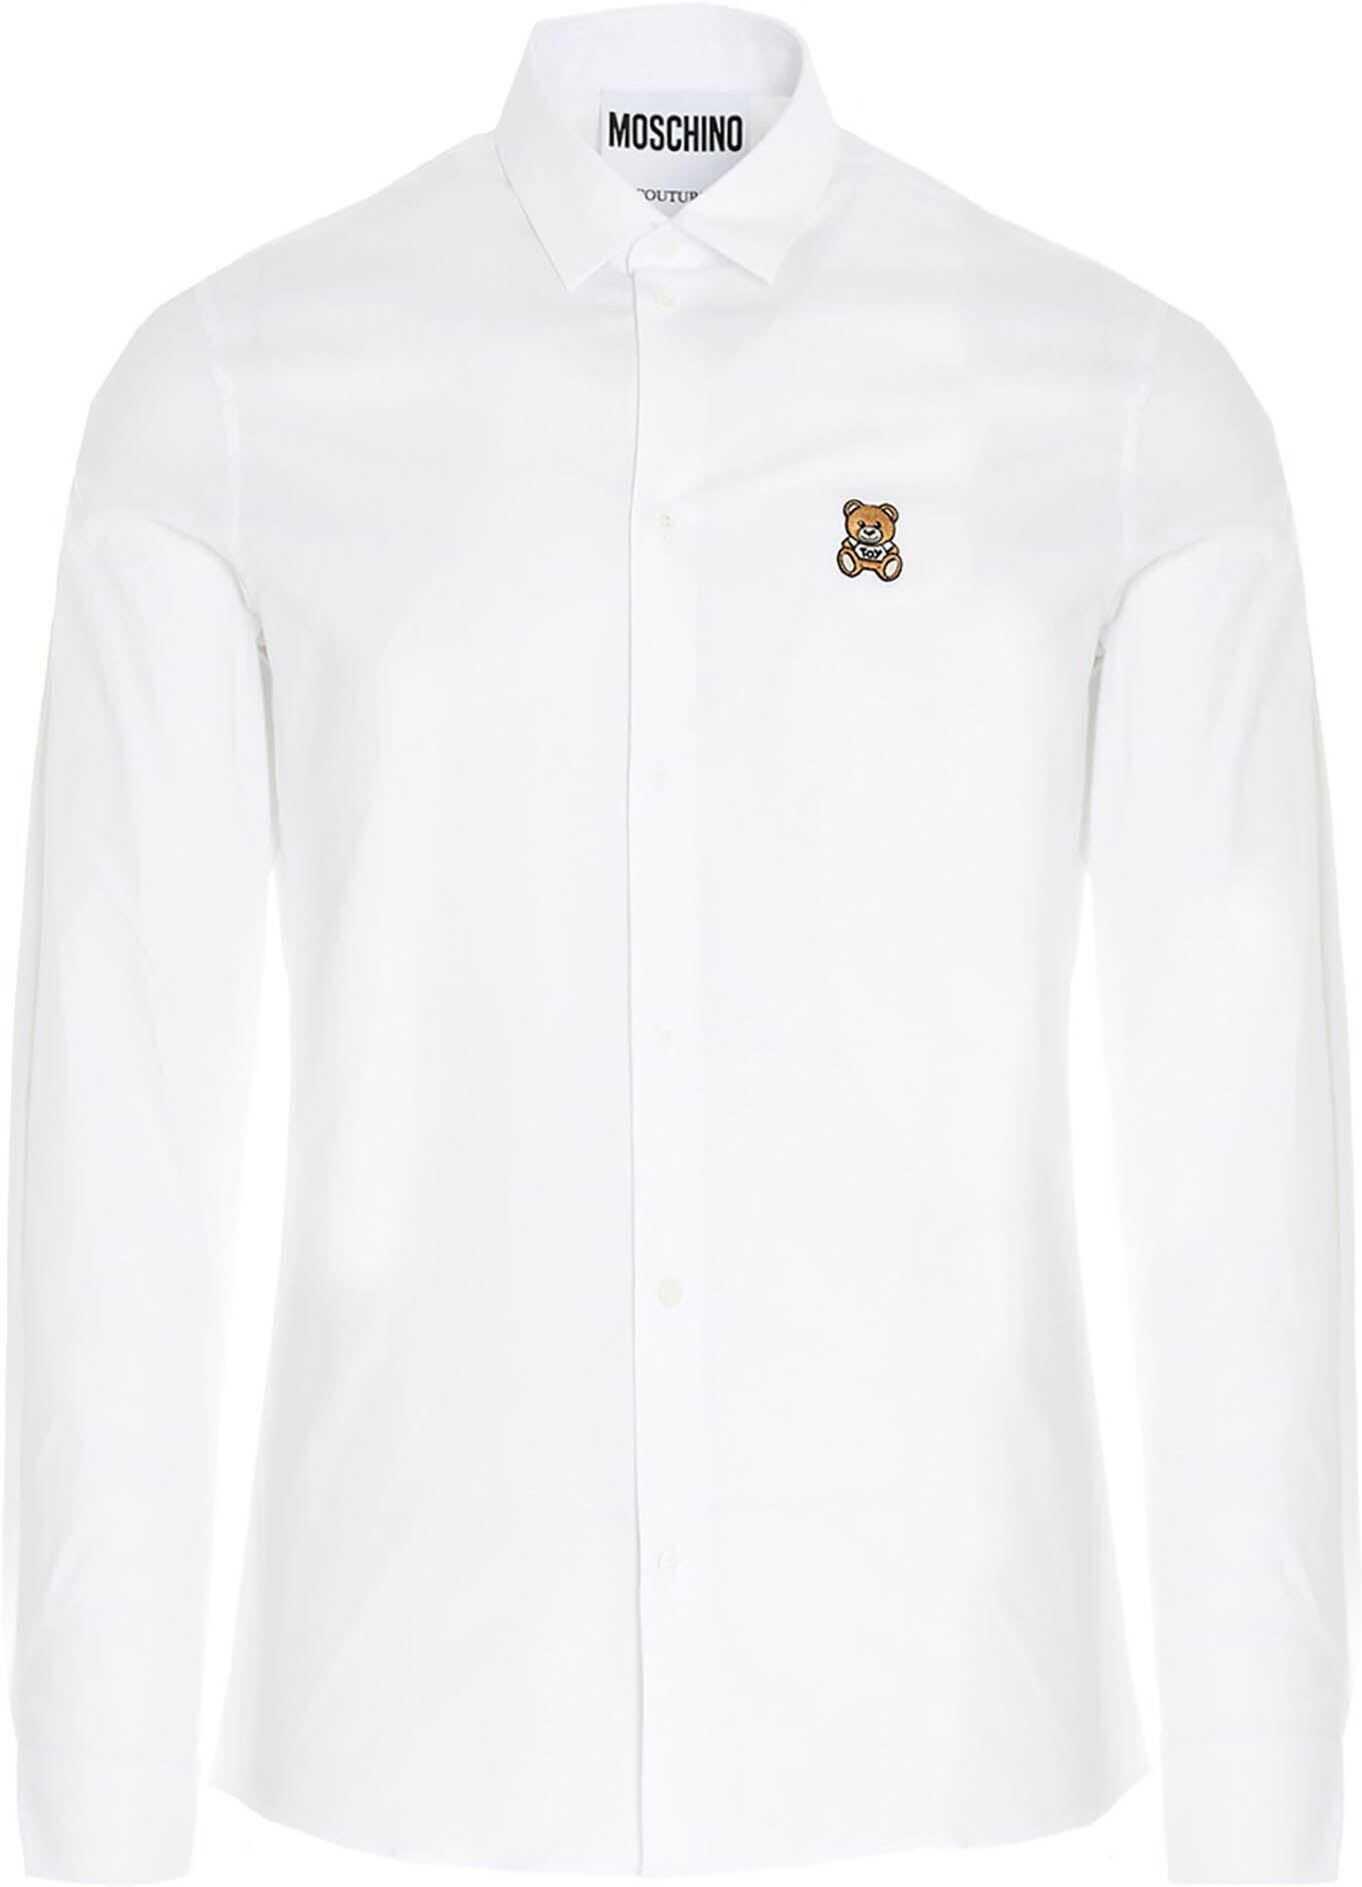 Moschino Teddy Patch Shirt In White White imagine